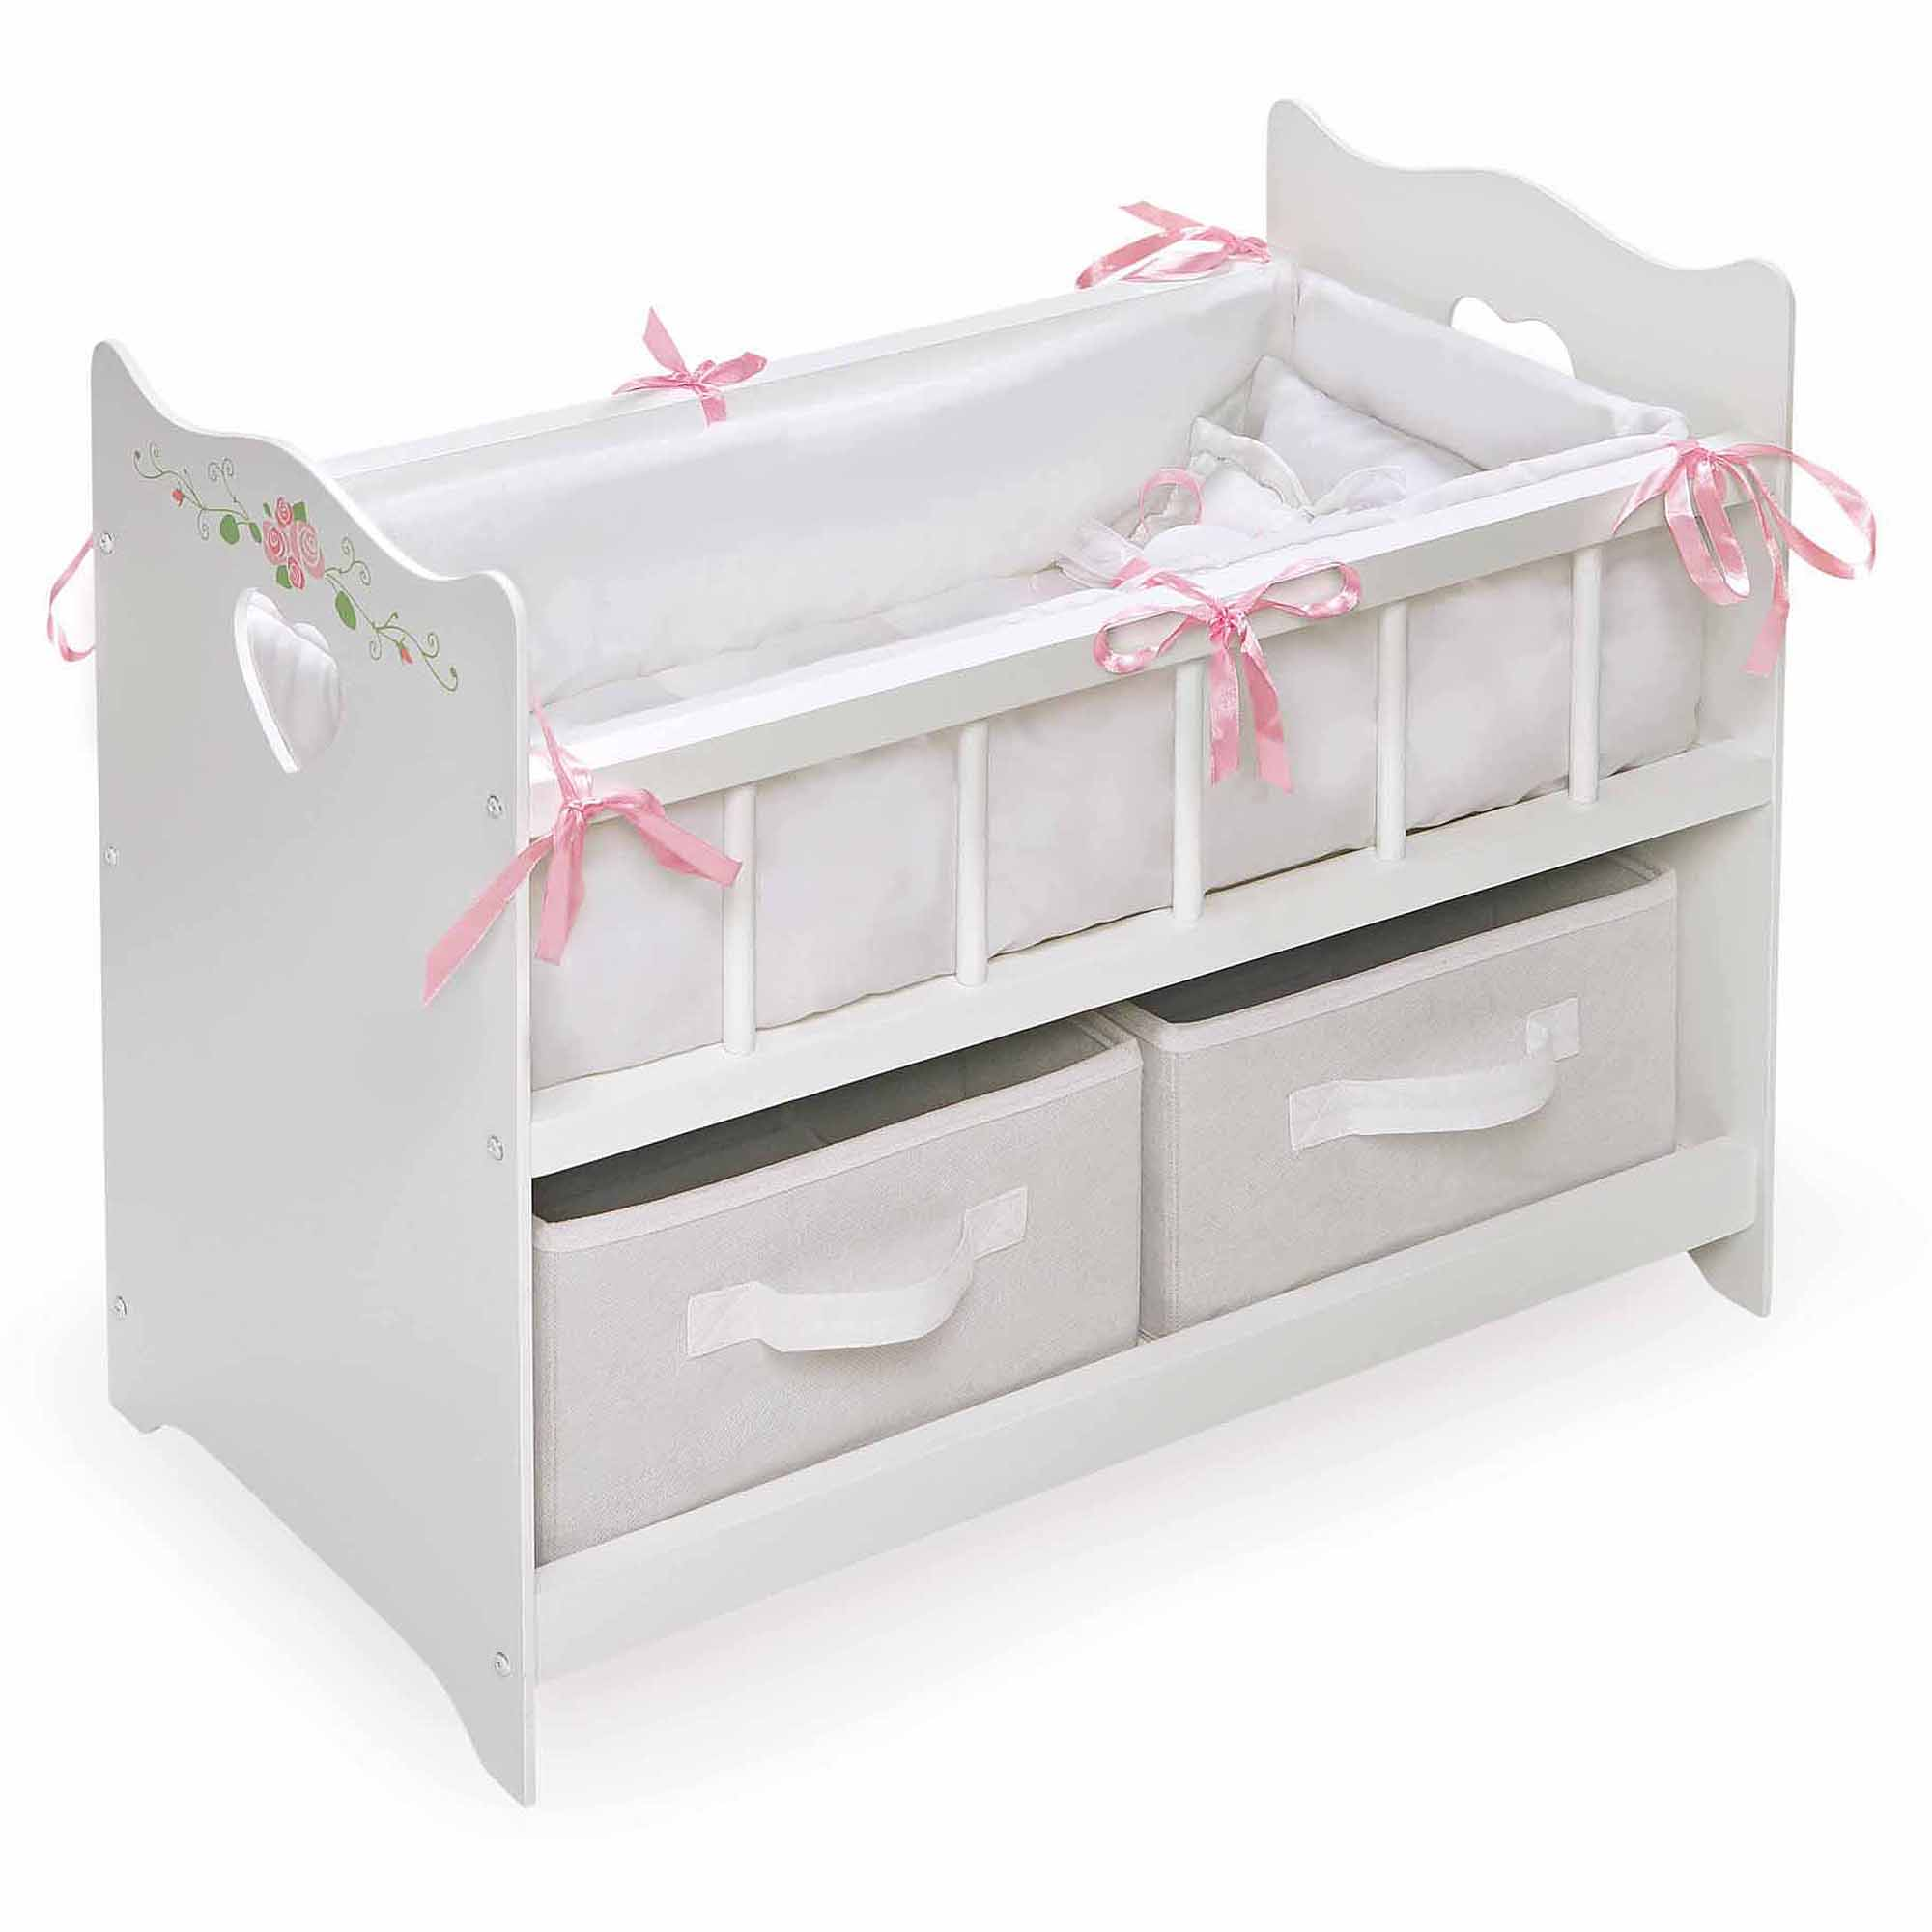 Baby cribs canada sale - Baby Cribs Canada Sale 16